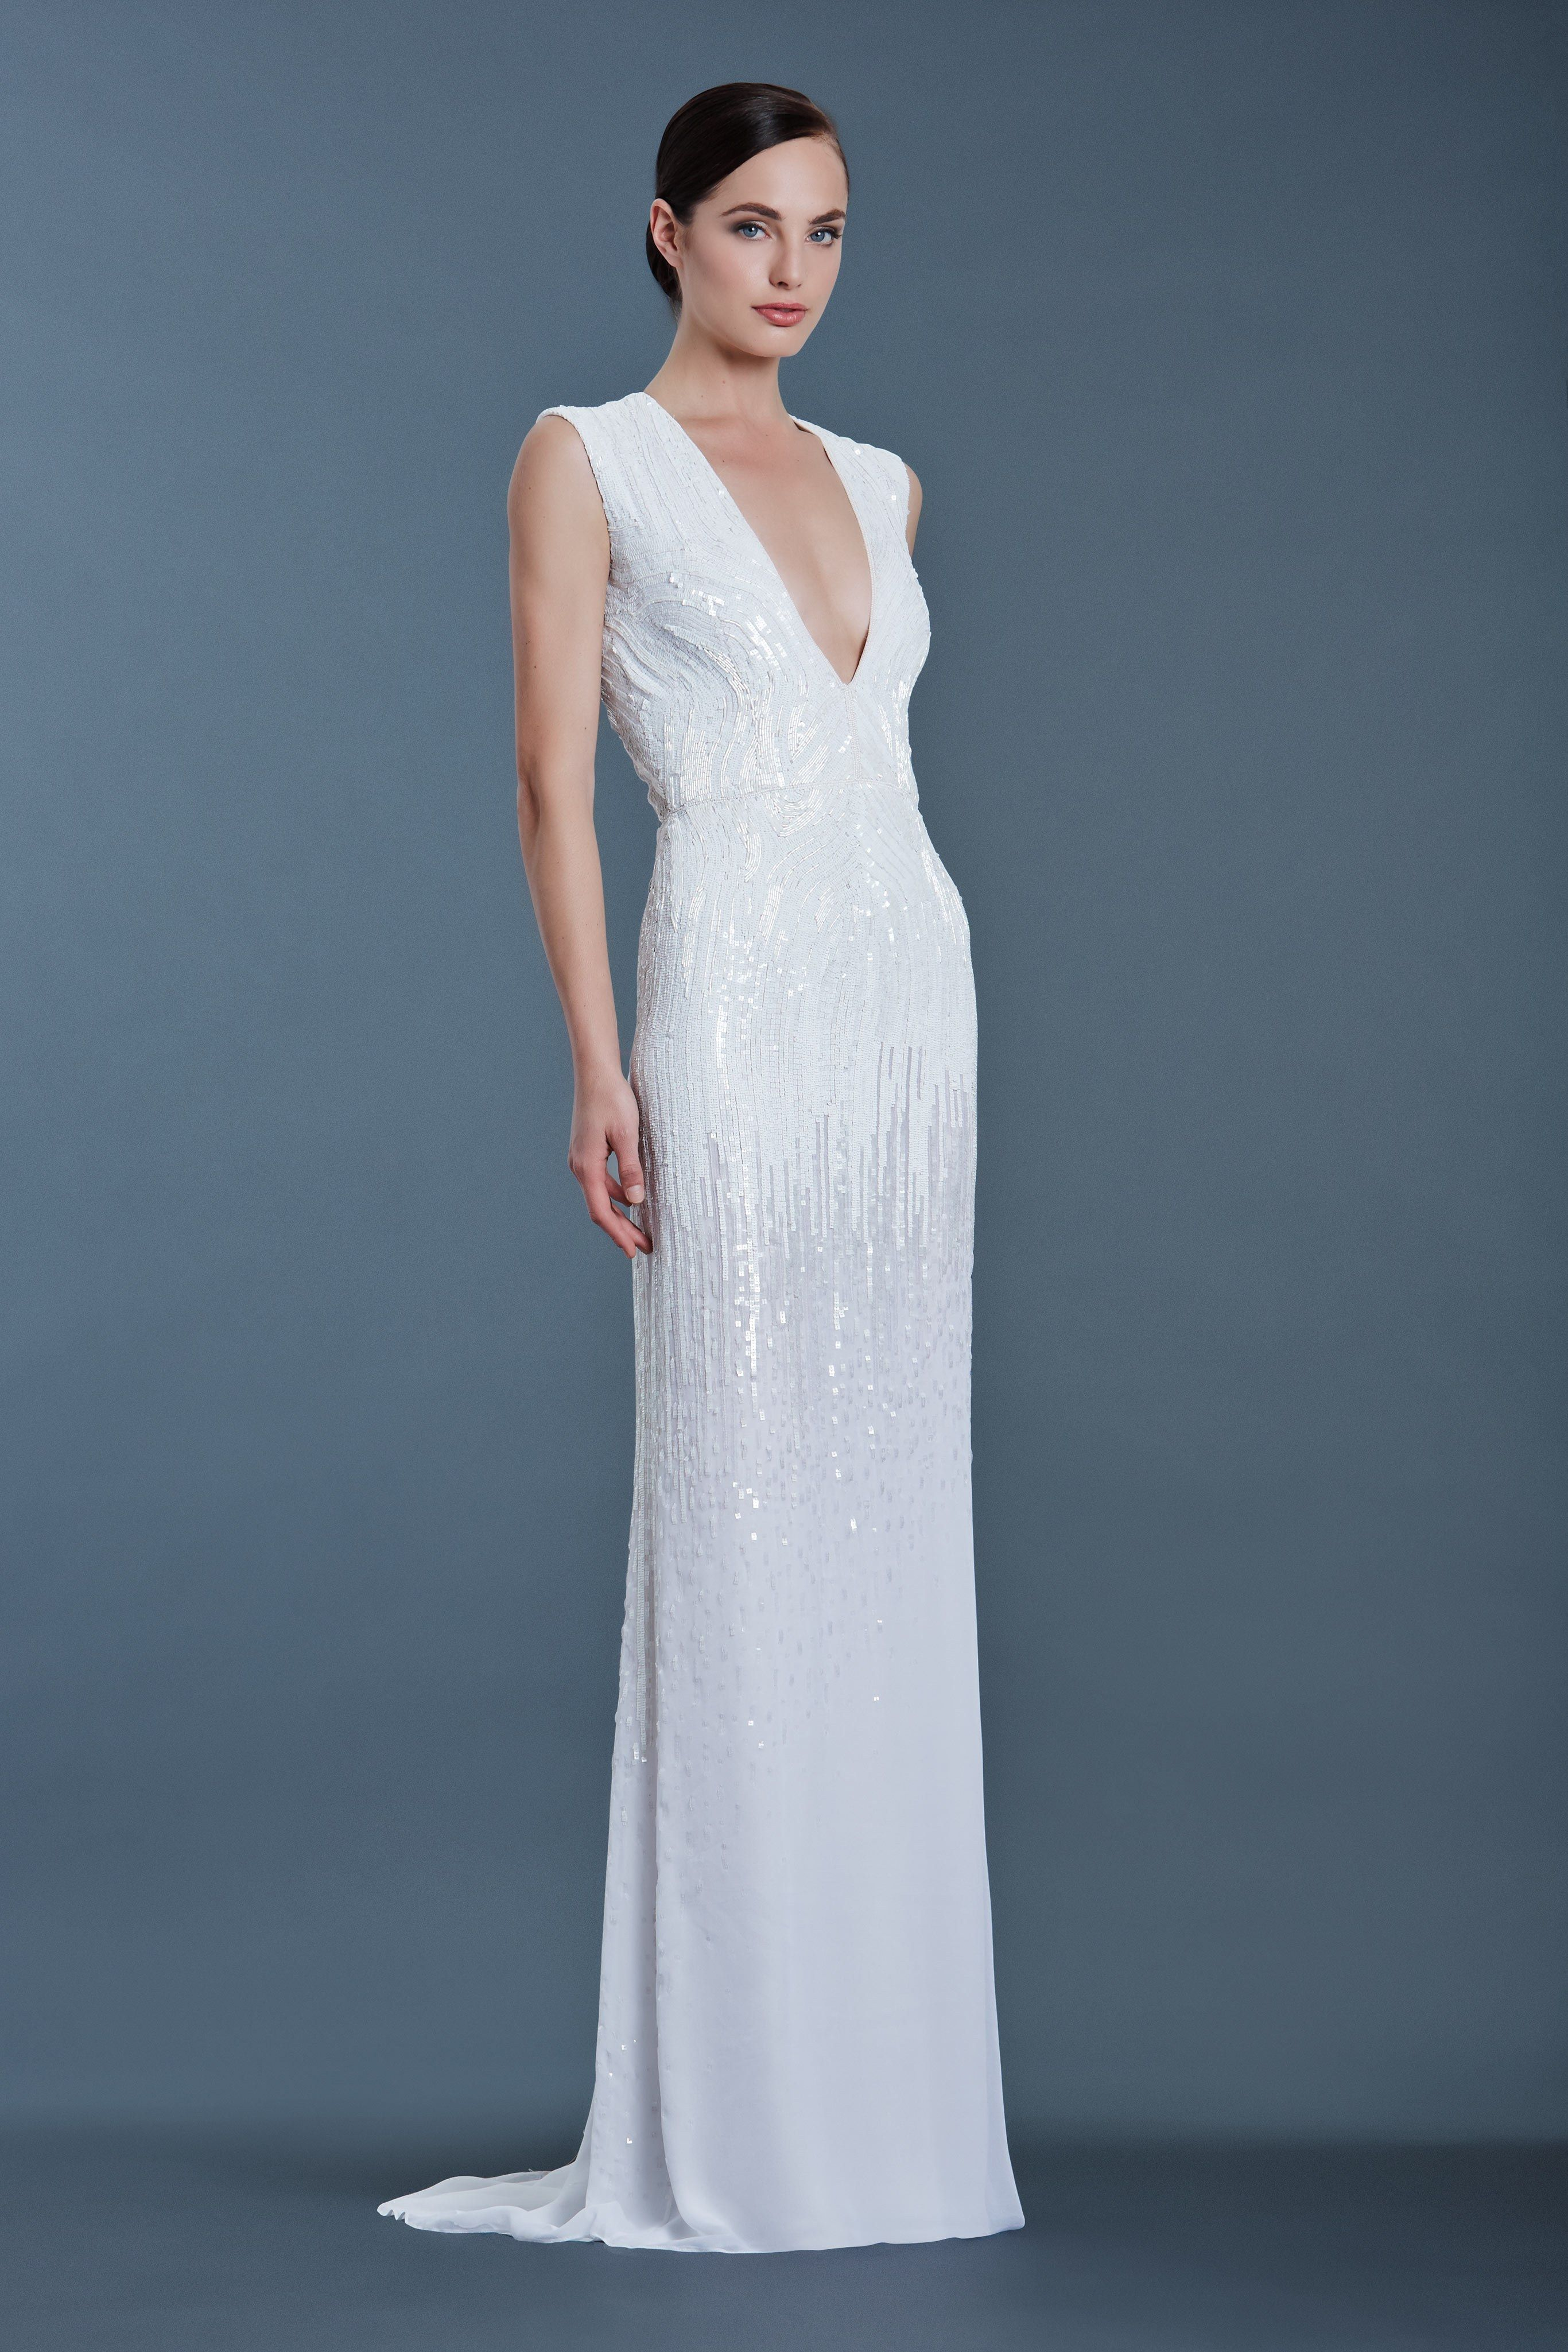 J Mendel Bridal Fall 2016 Fashion Show In 2020 Bridal Gown Trends J Mendel Bridal Beautiful Dresses